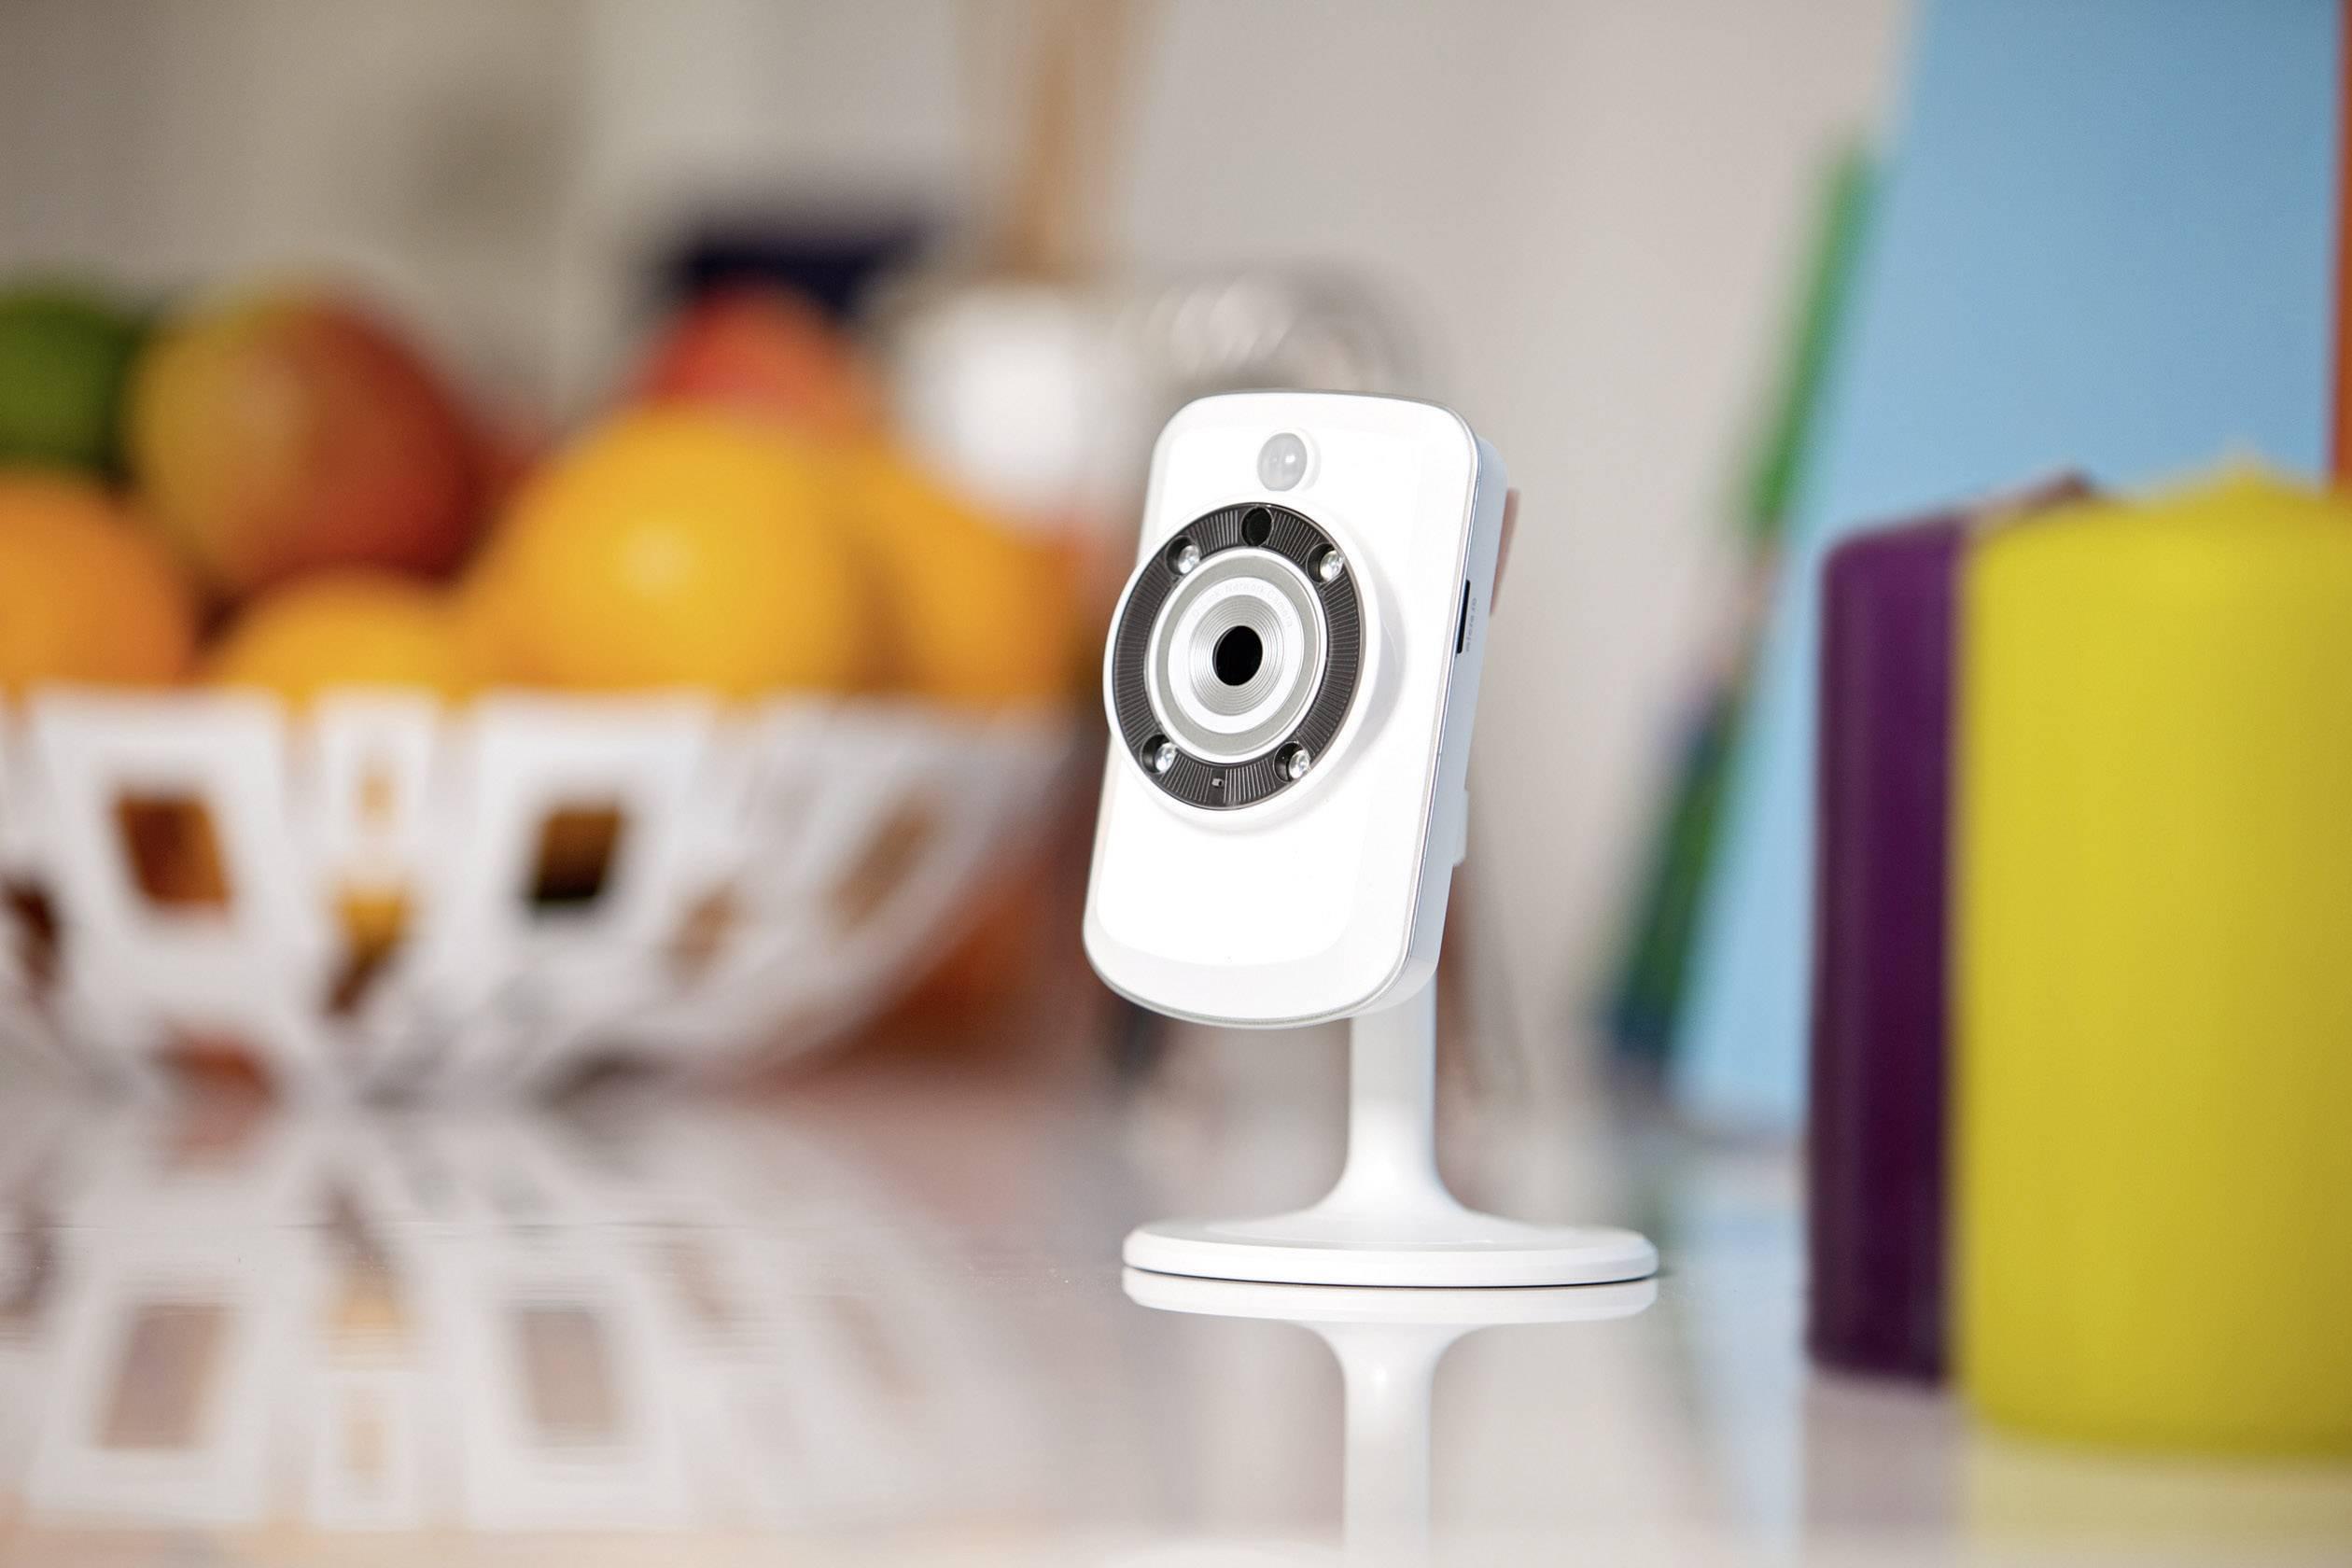 Bezdrôtová Cloud kamera D-Link DCS-933L/E s detekciou zvuku, 640 x 480 px, IR LED